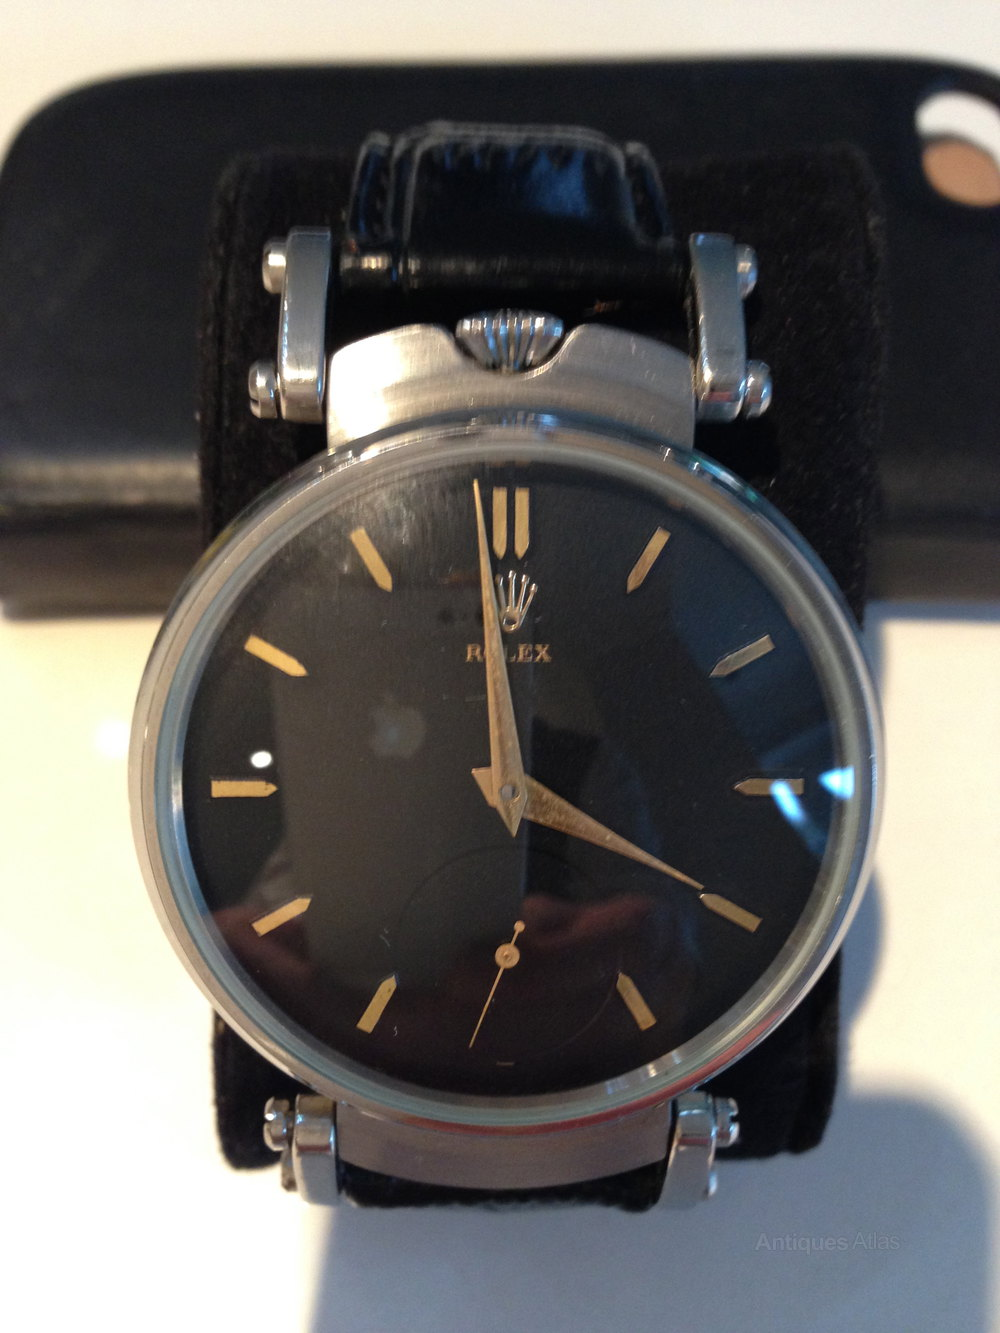 antiques atlas rolex wrist watch